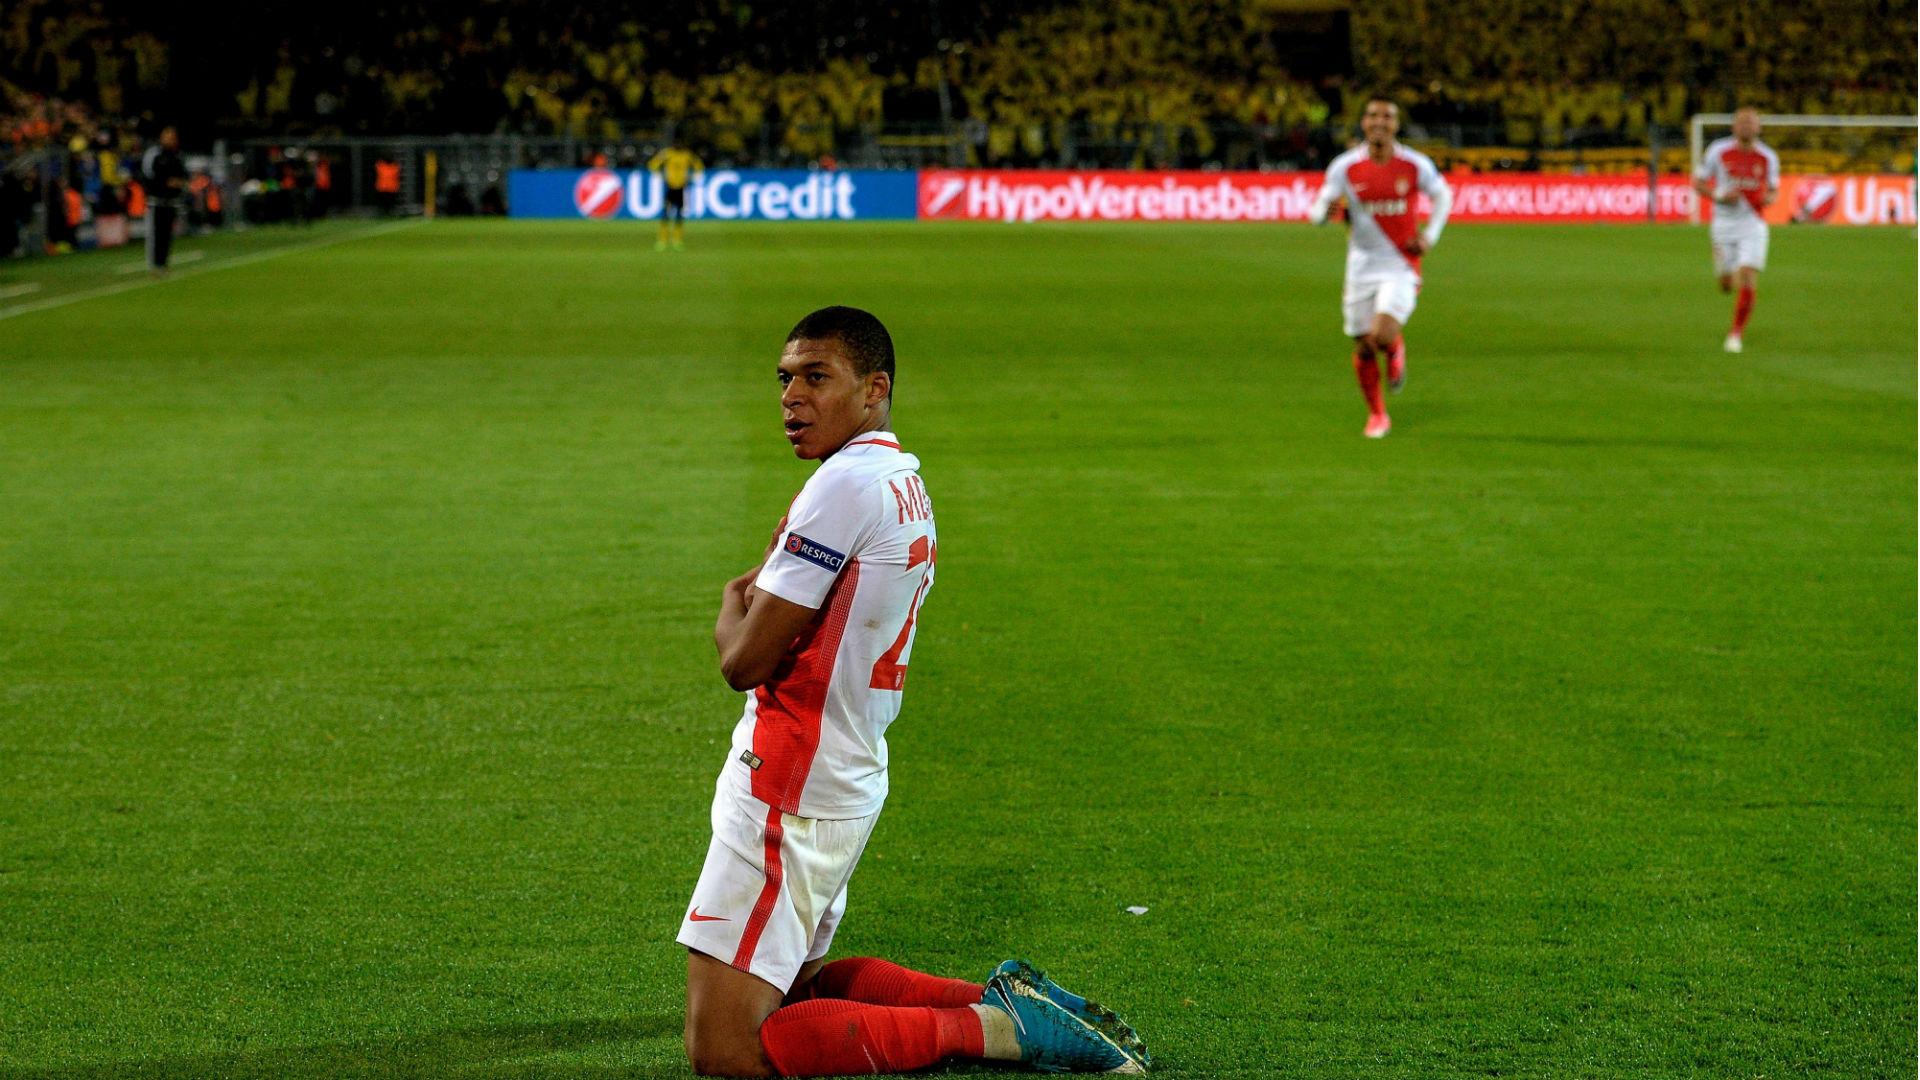 Kylian Mbappé Dortmund